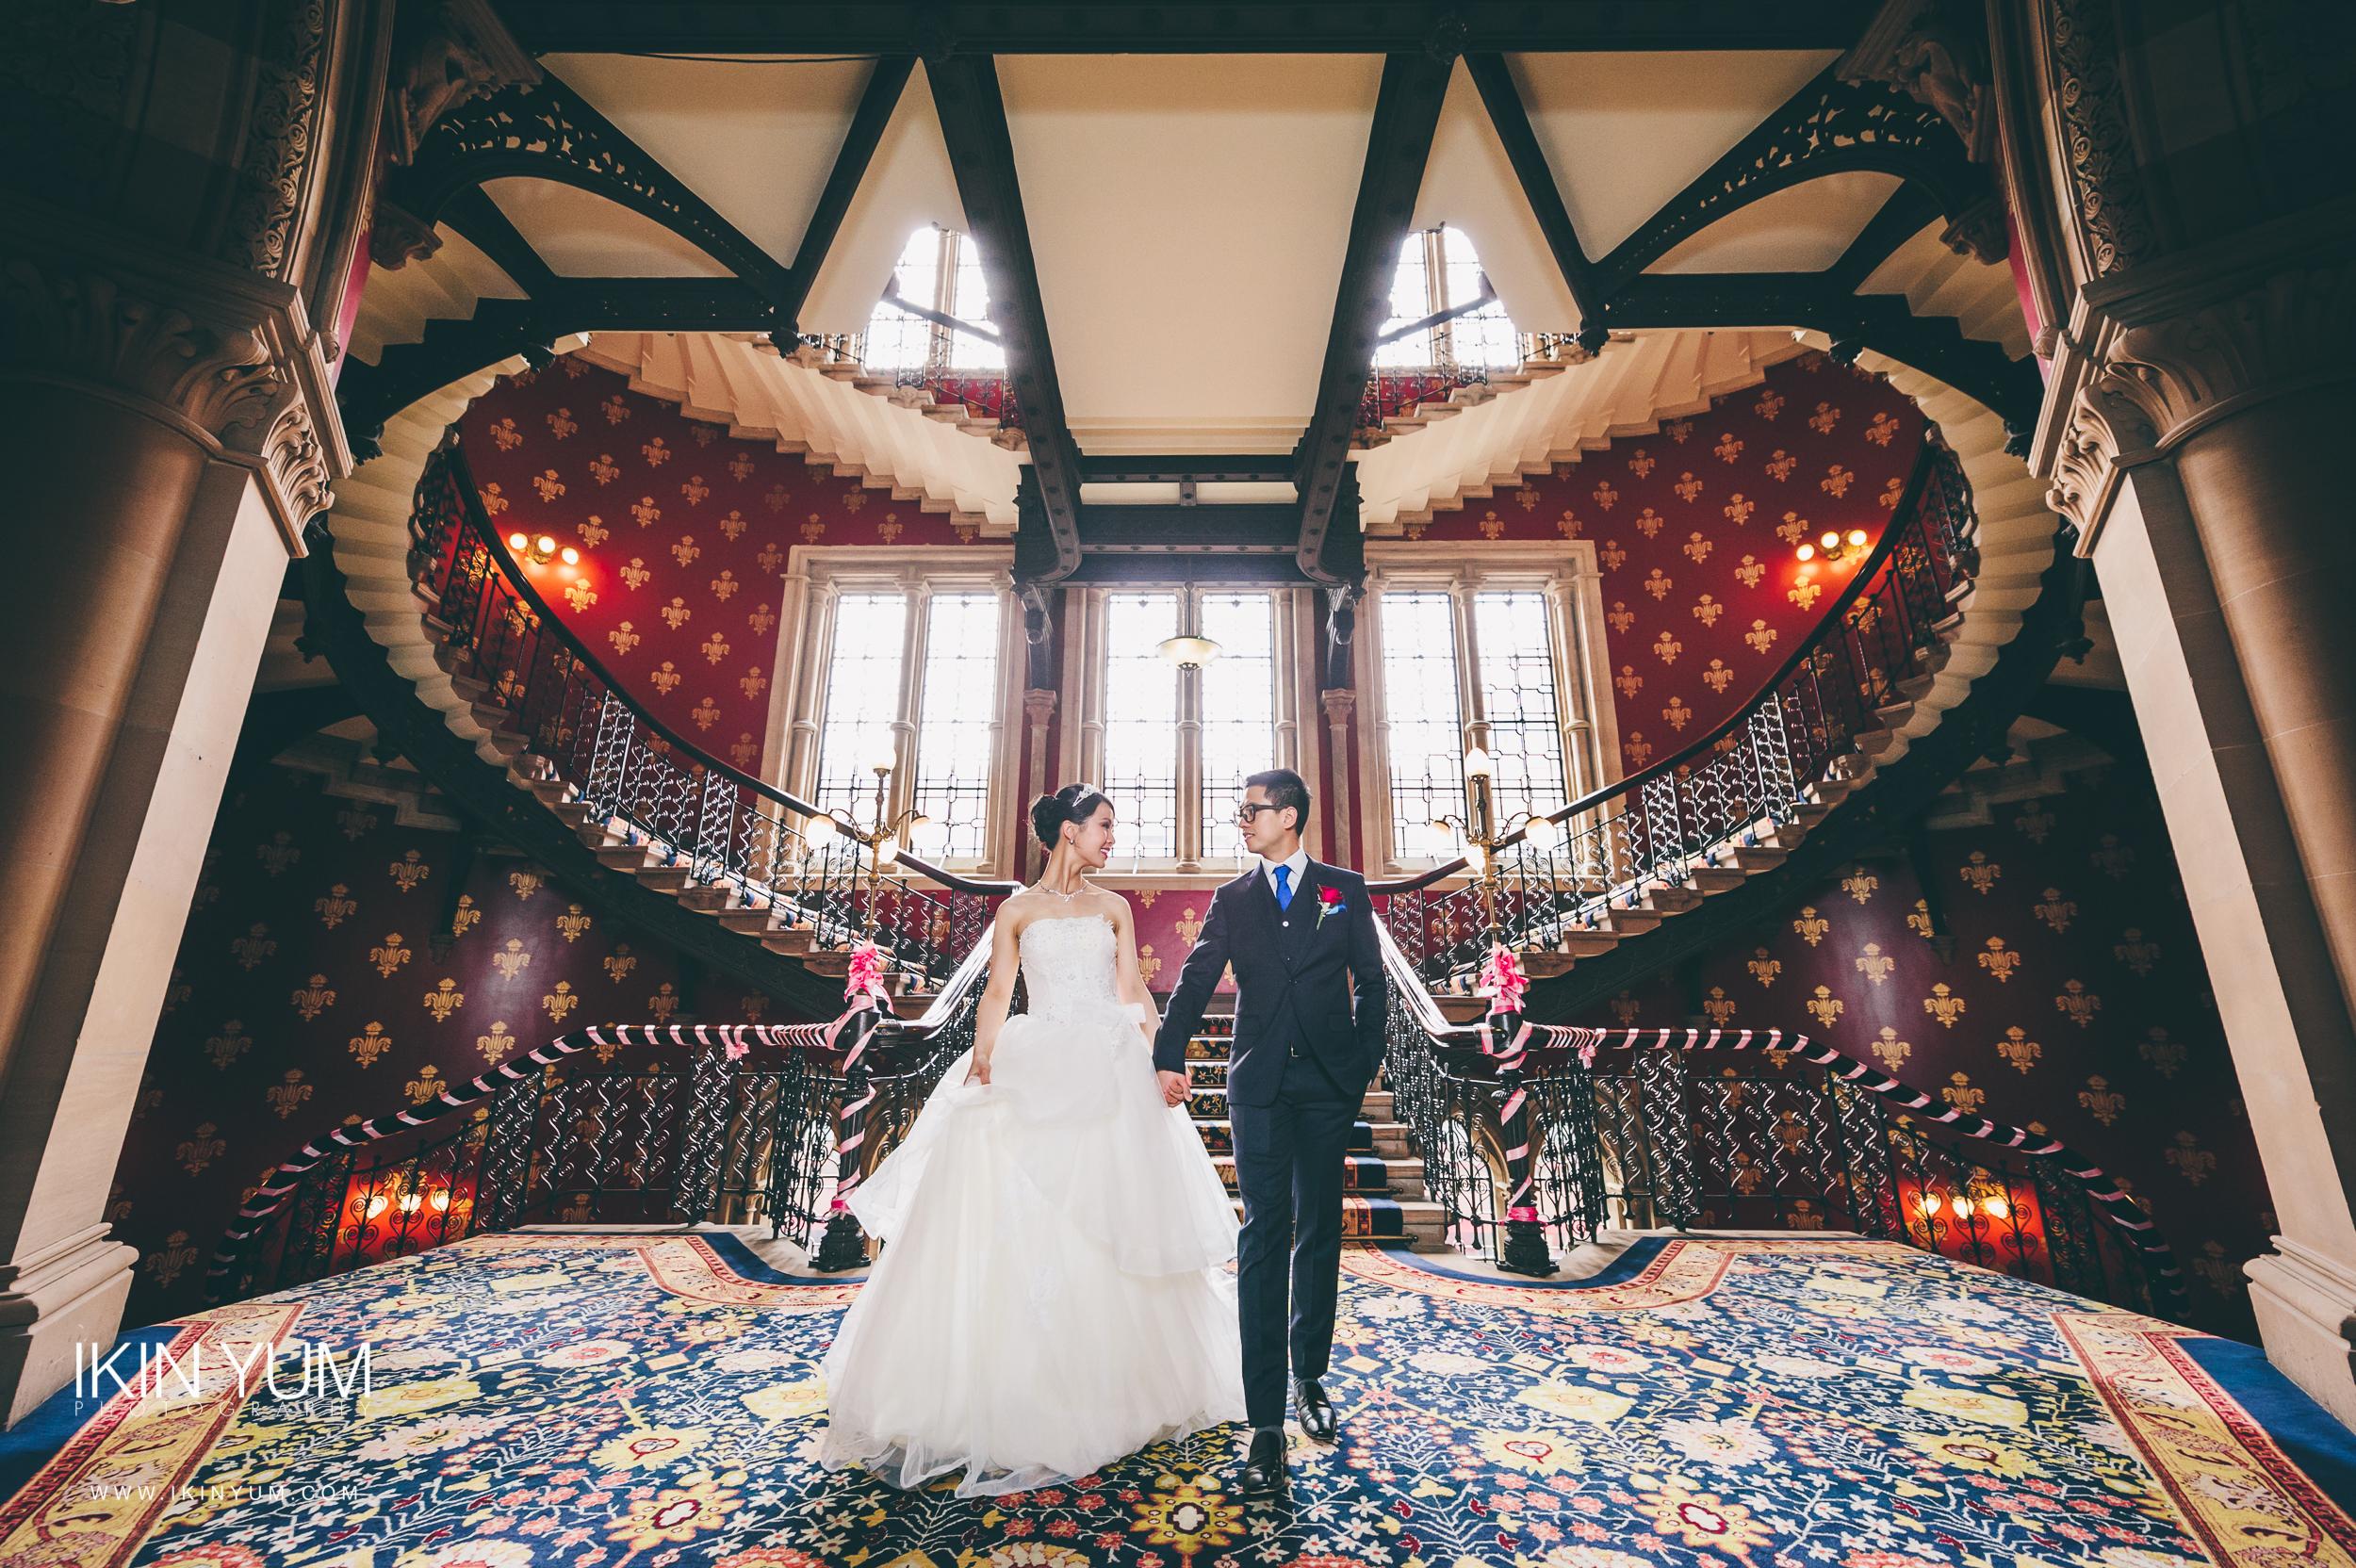 St Pancras Renaissance Hotel - Wedding - Ikin Yum Photography-055.jpg